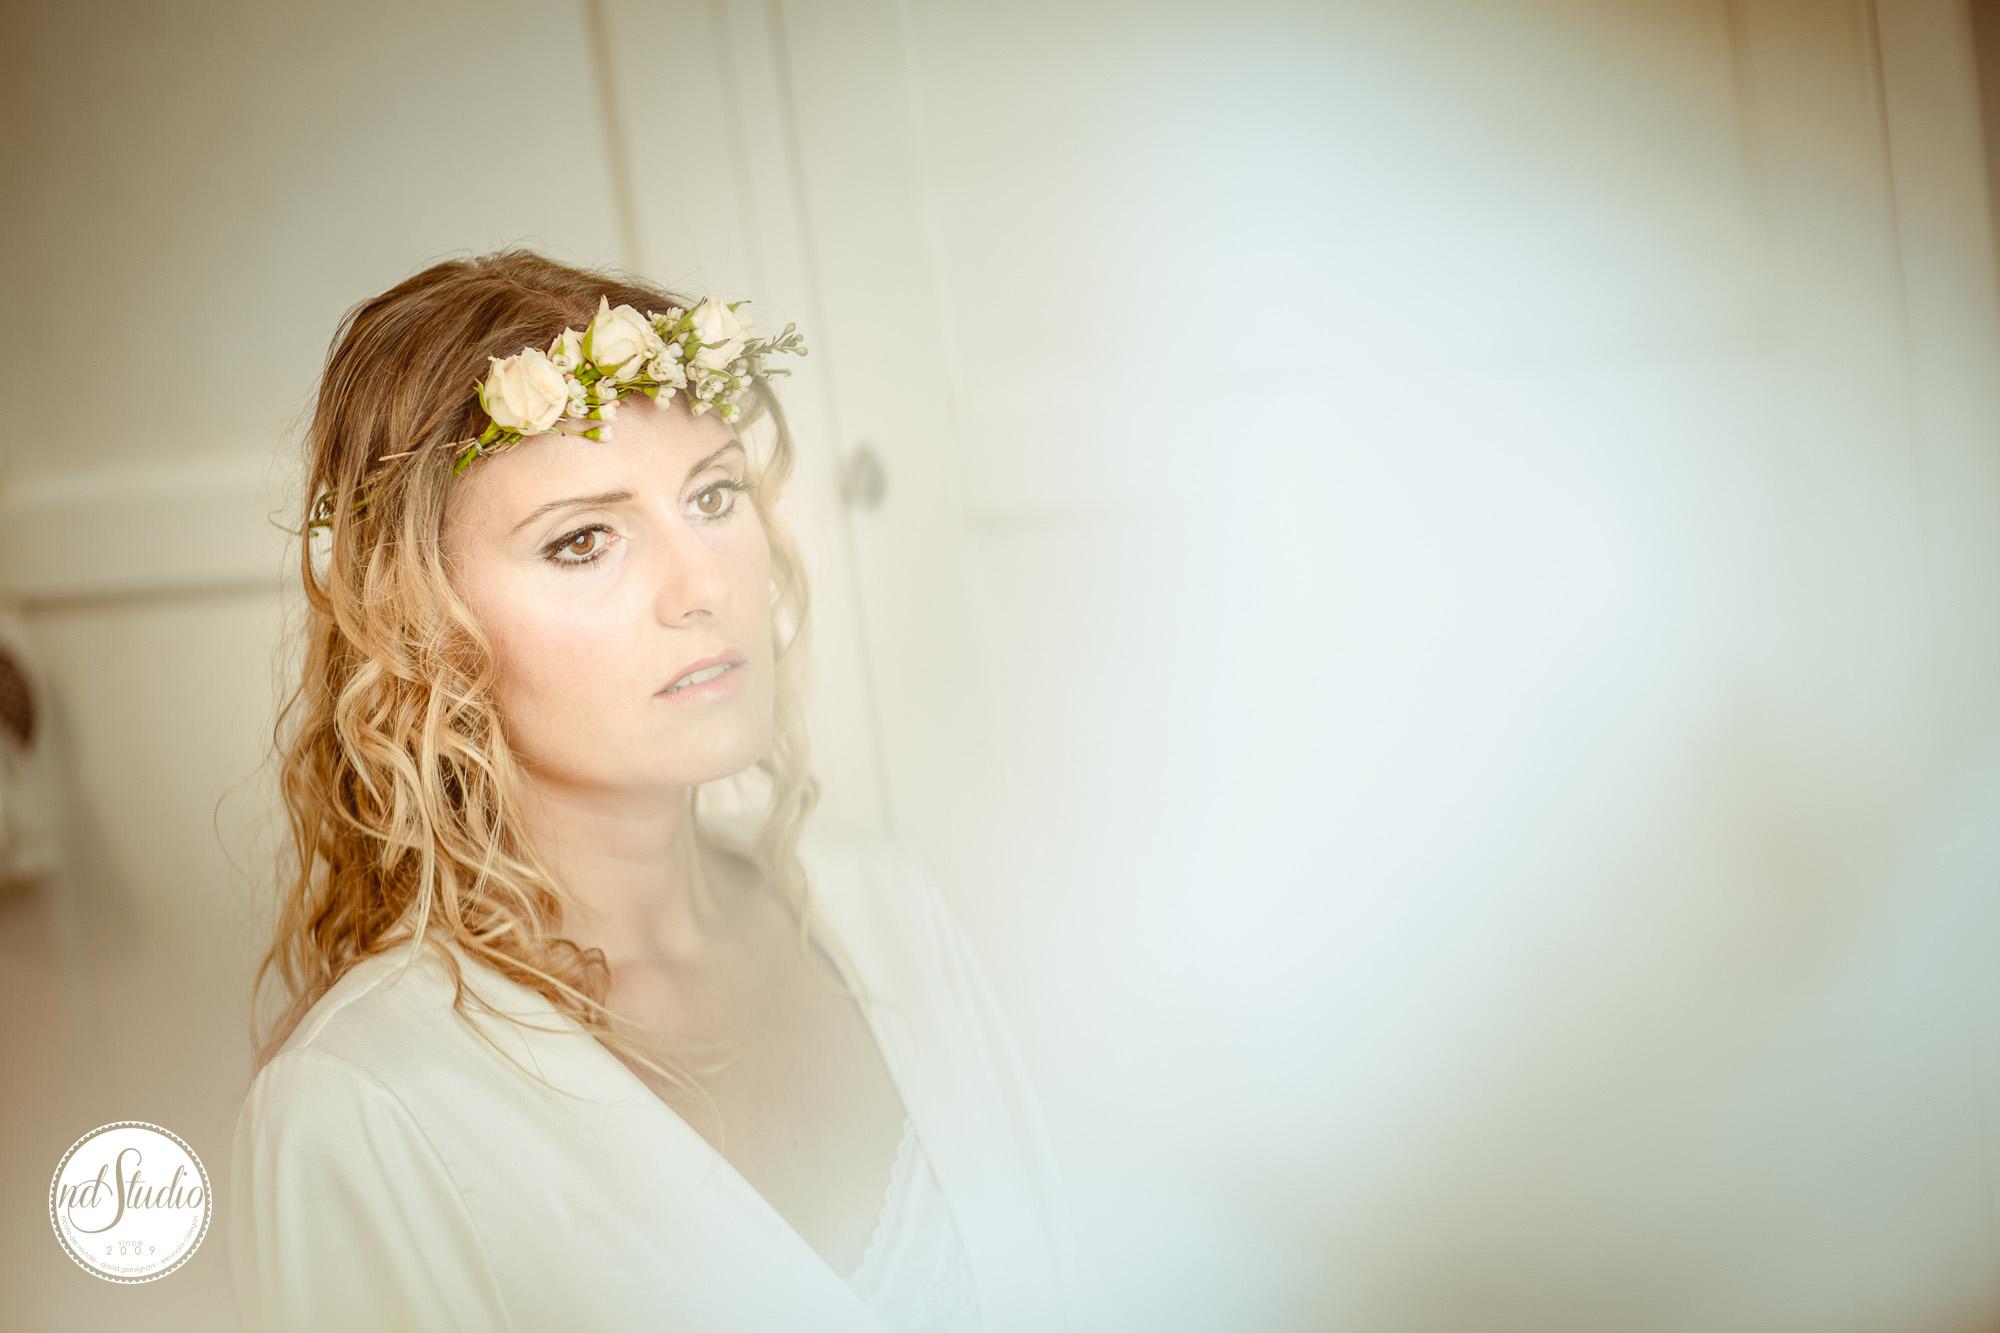 Matrimonio Country Chic Hair : Michele e alessandra matrimonio country chic